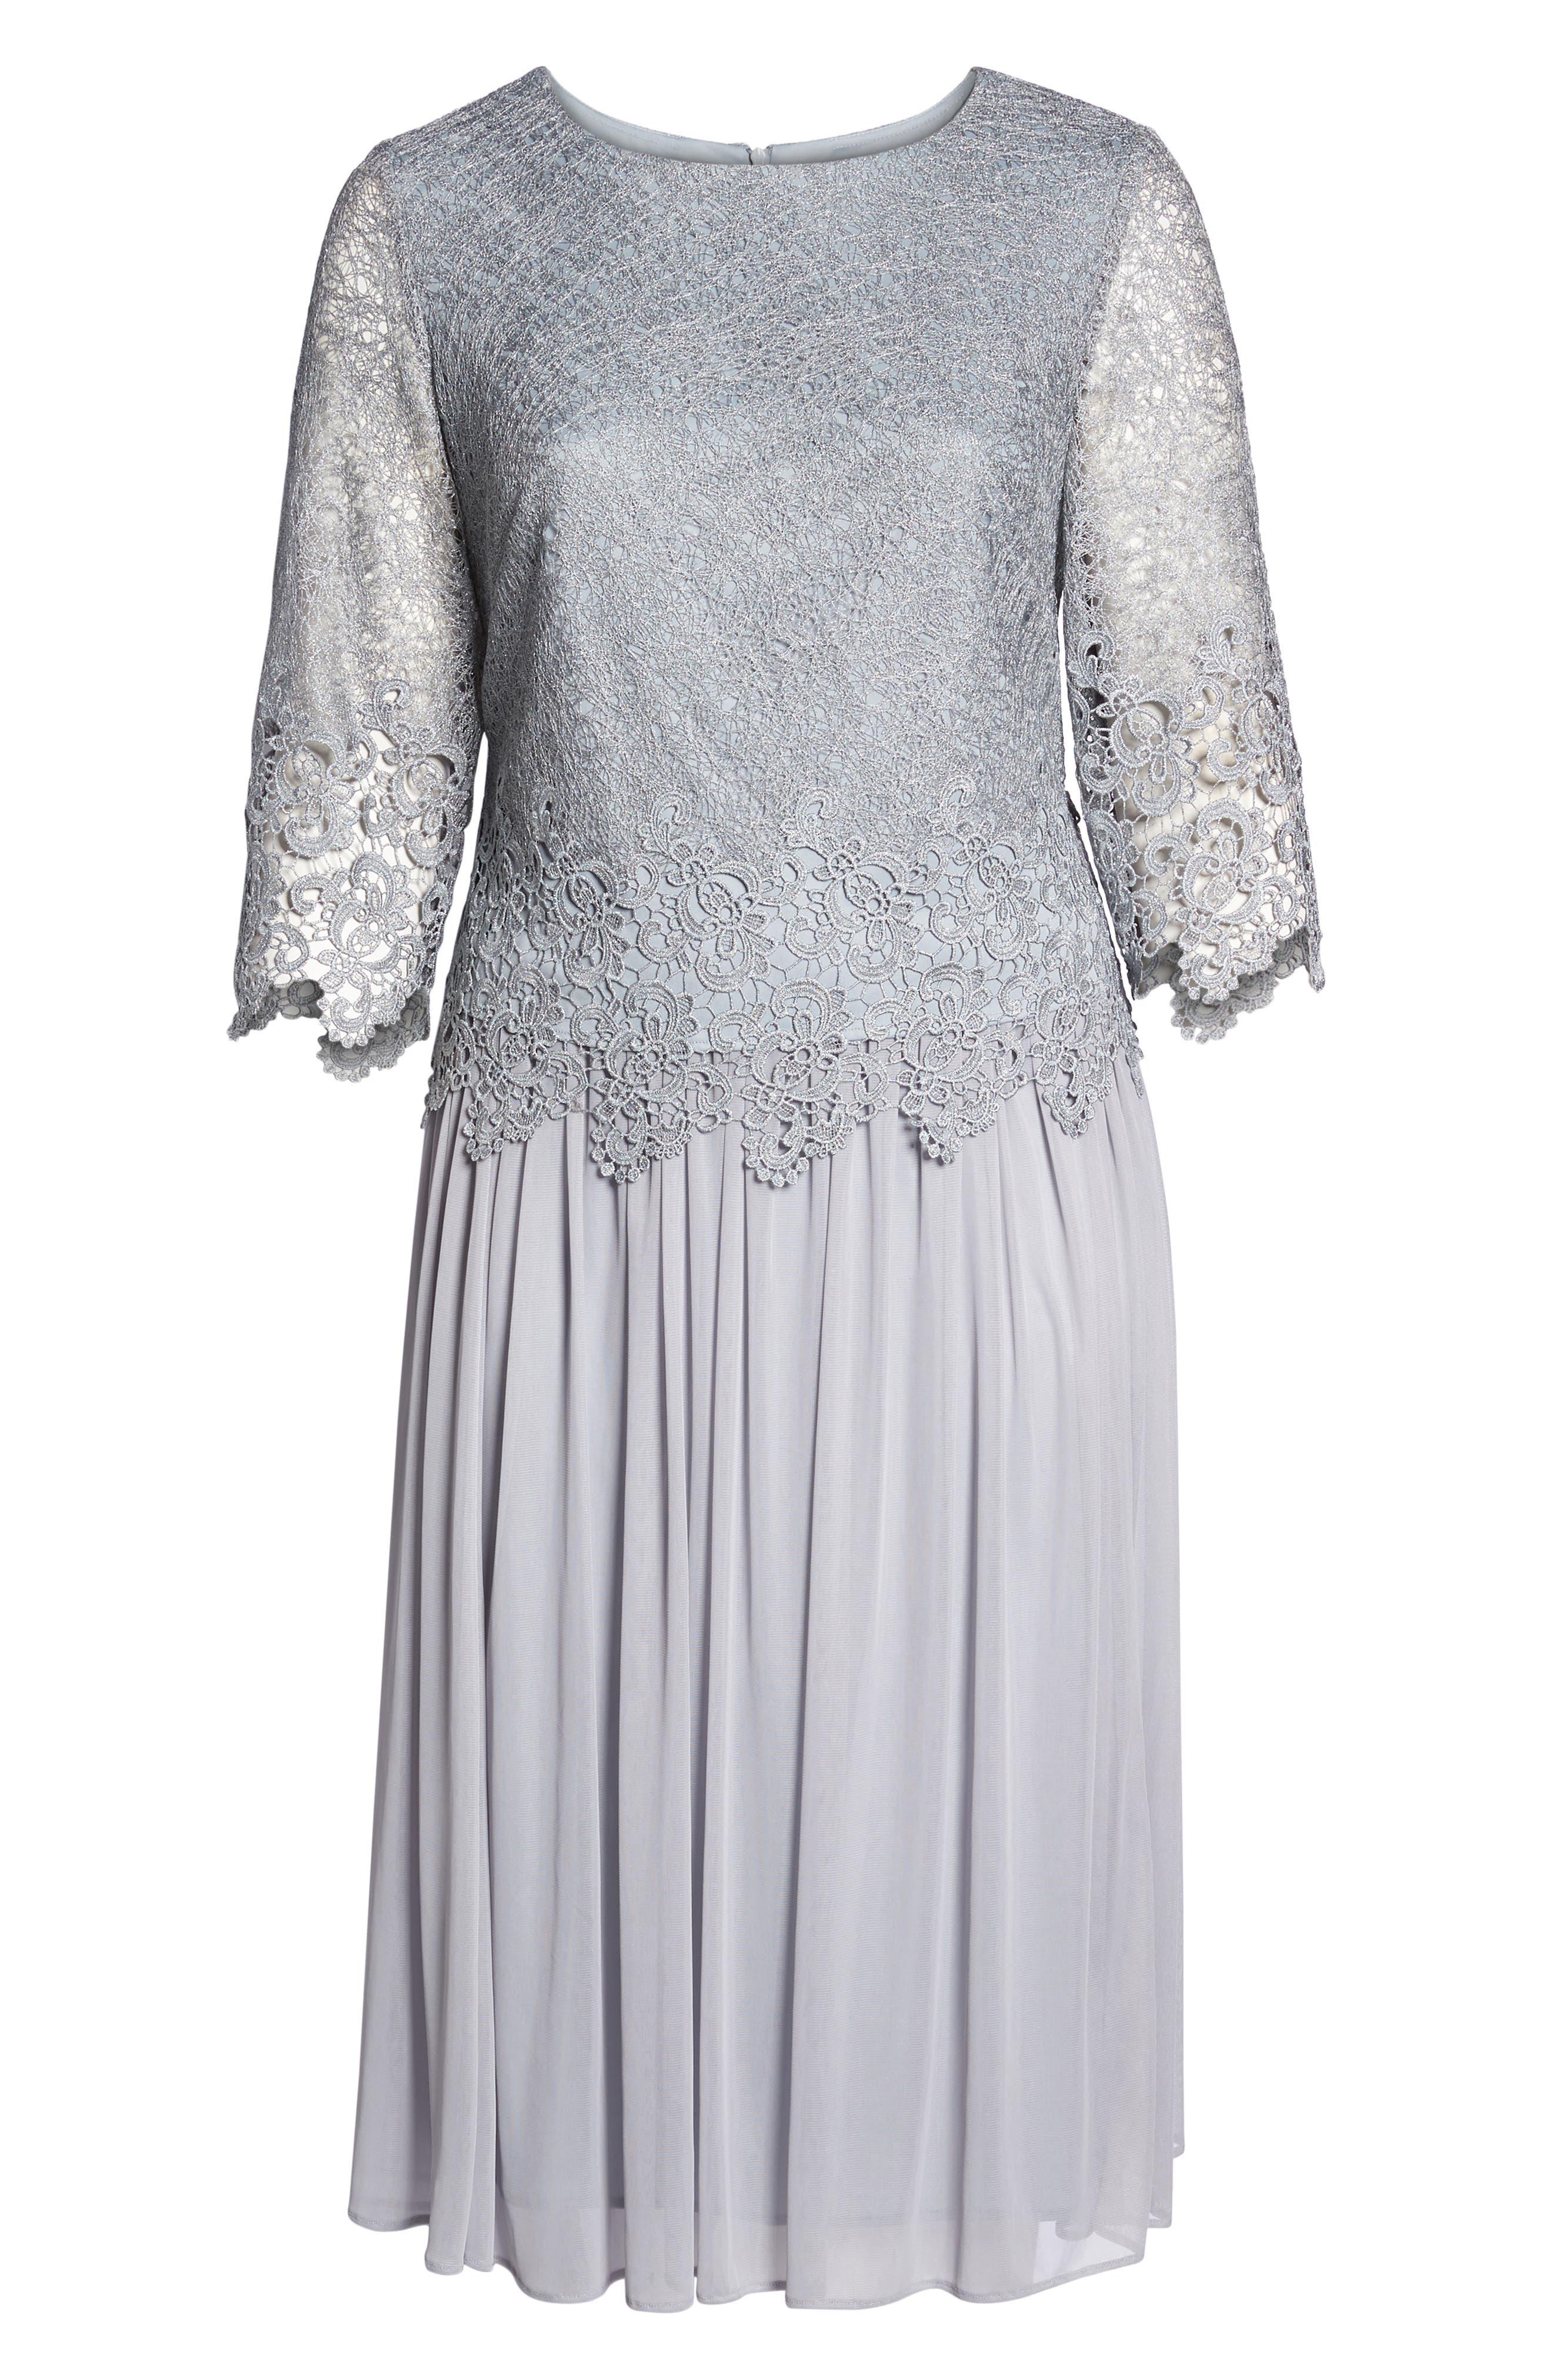 Lace & Chiffon Tea Length Dress,                             Alternate thumbnail 6, color,                             SILVER